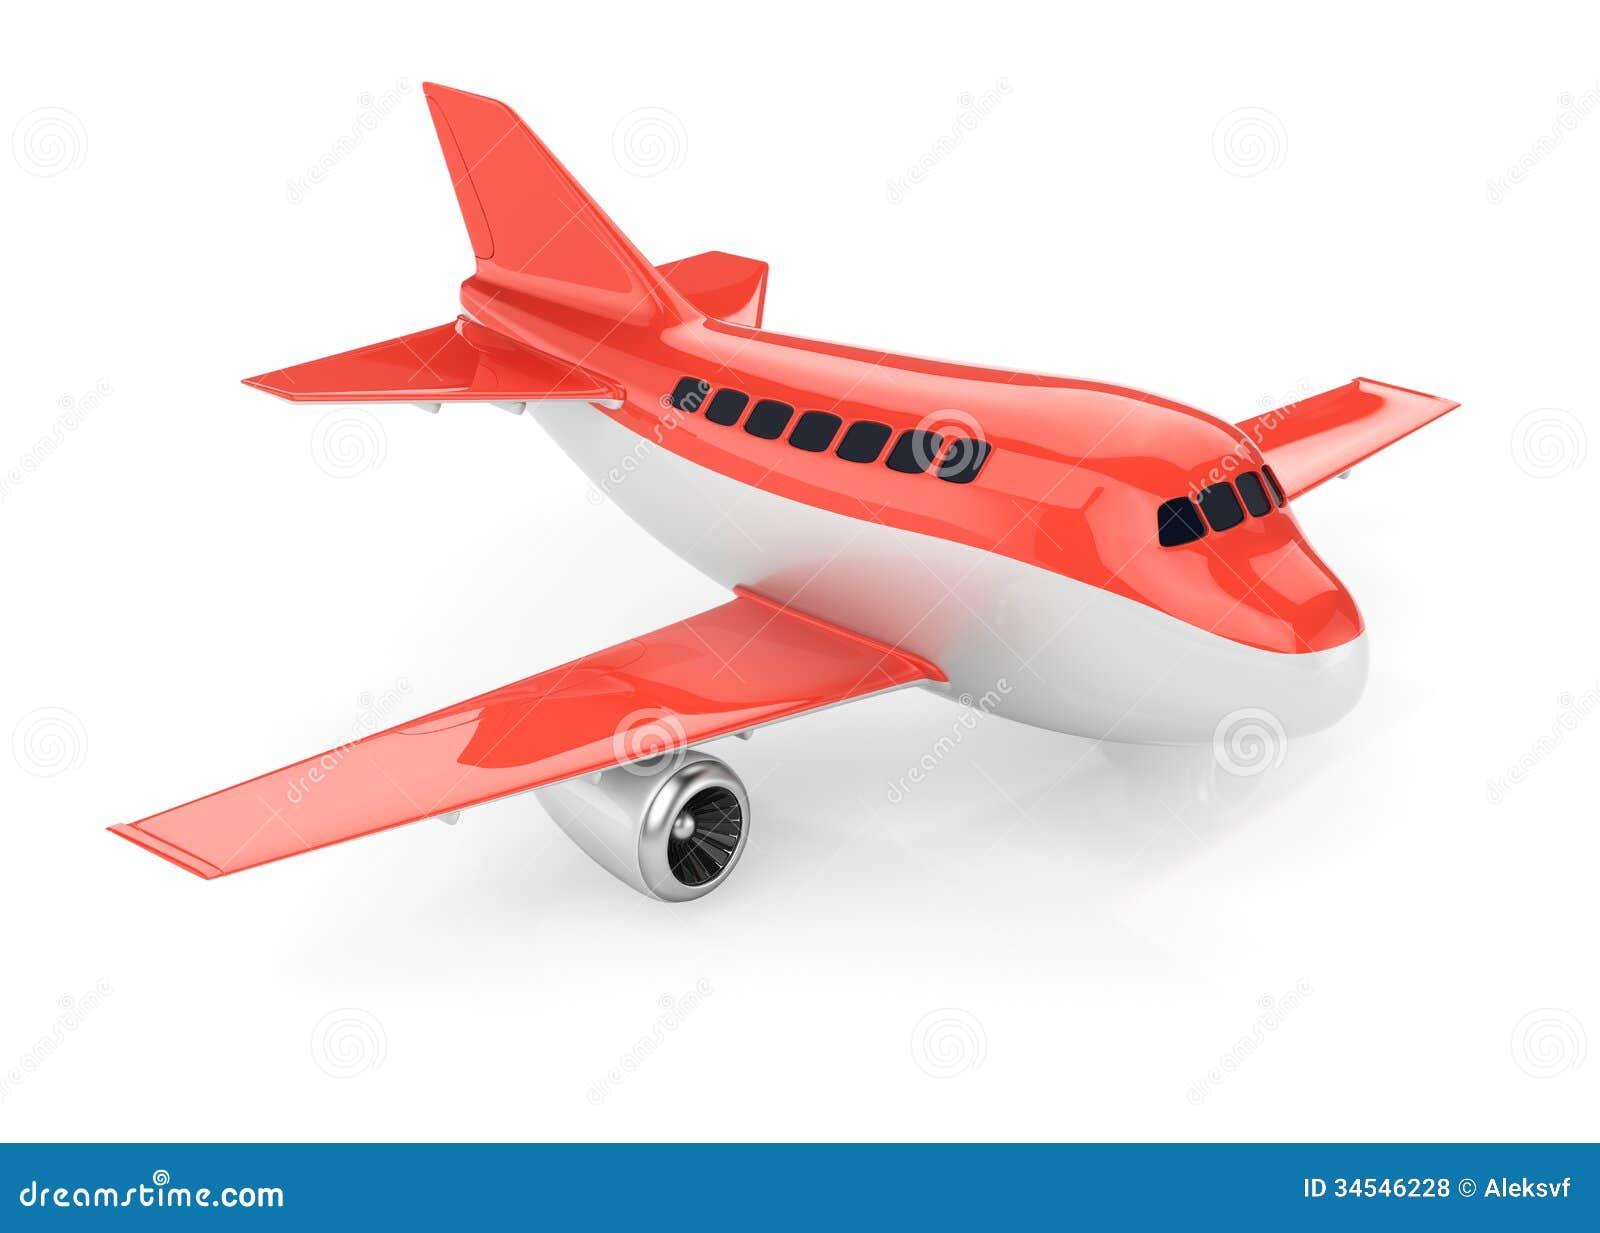 Airplane Royalty Free Stock Photos - Image: 34546228